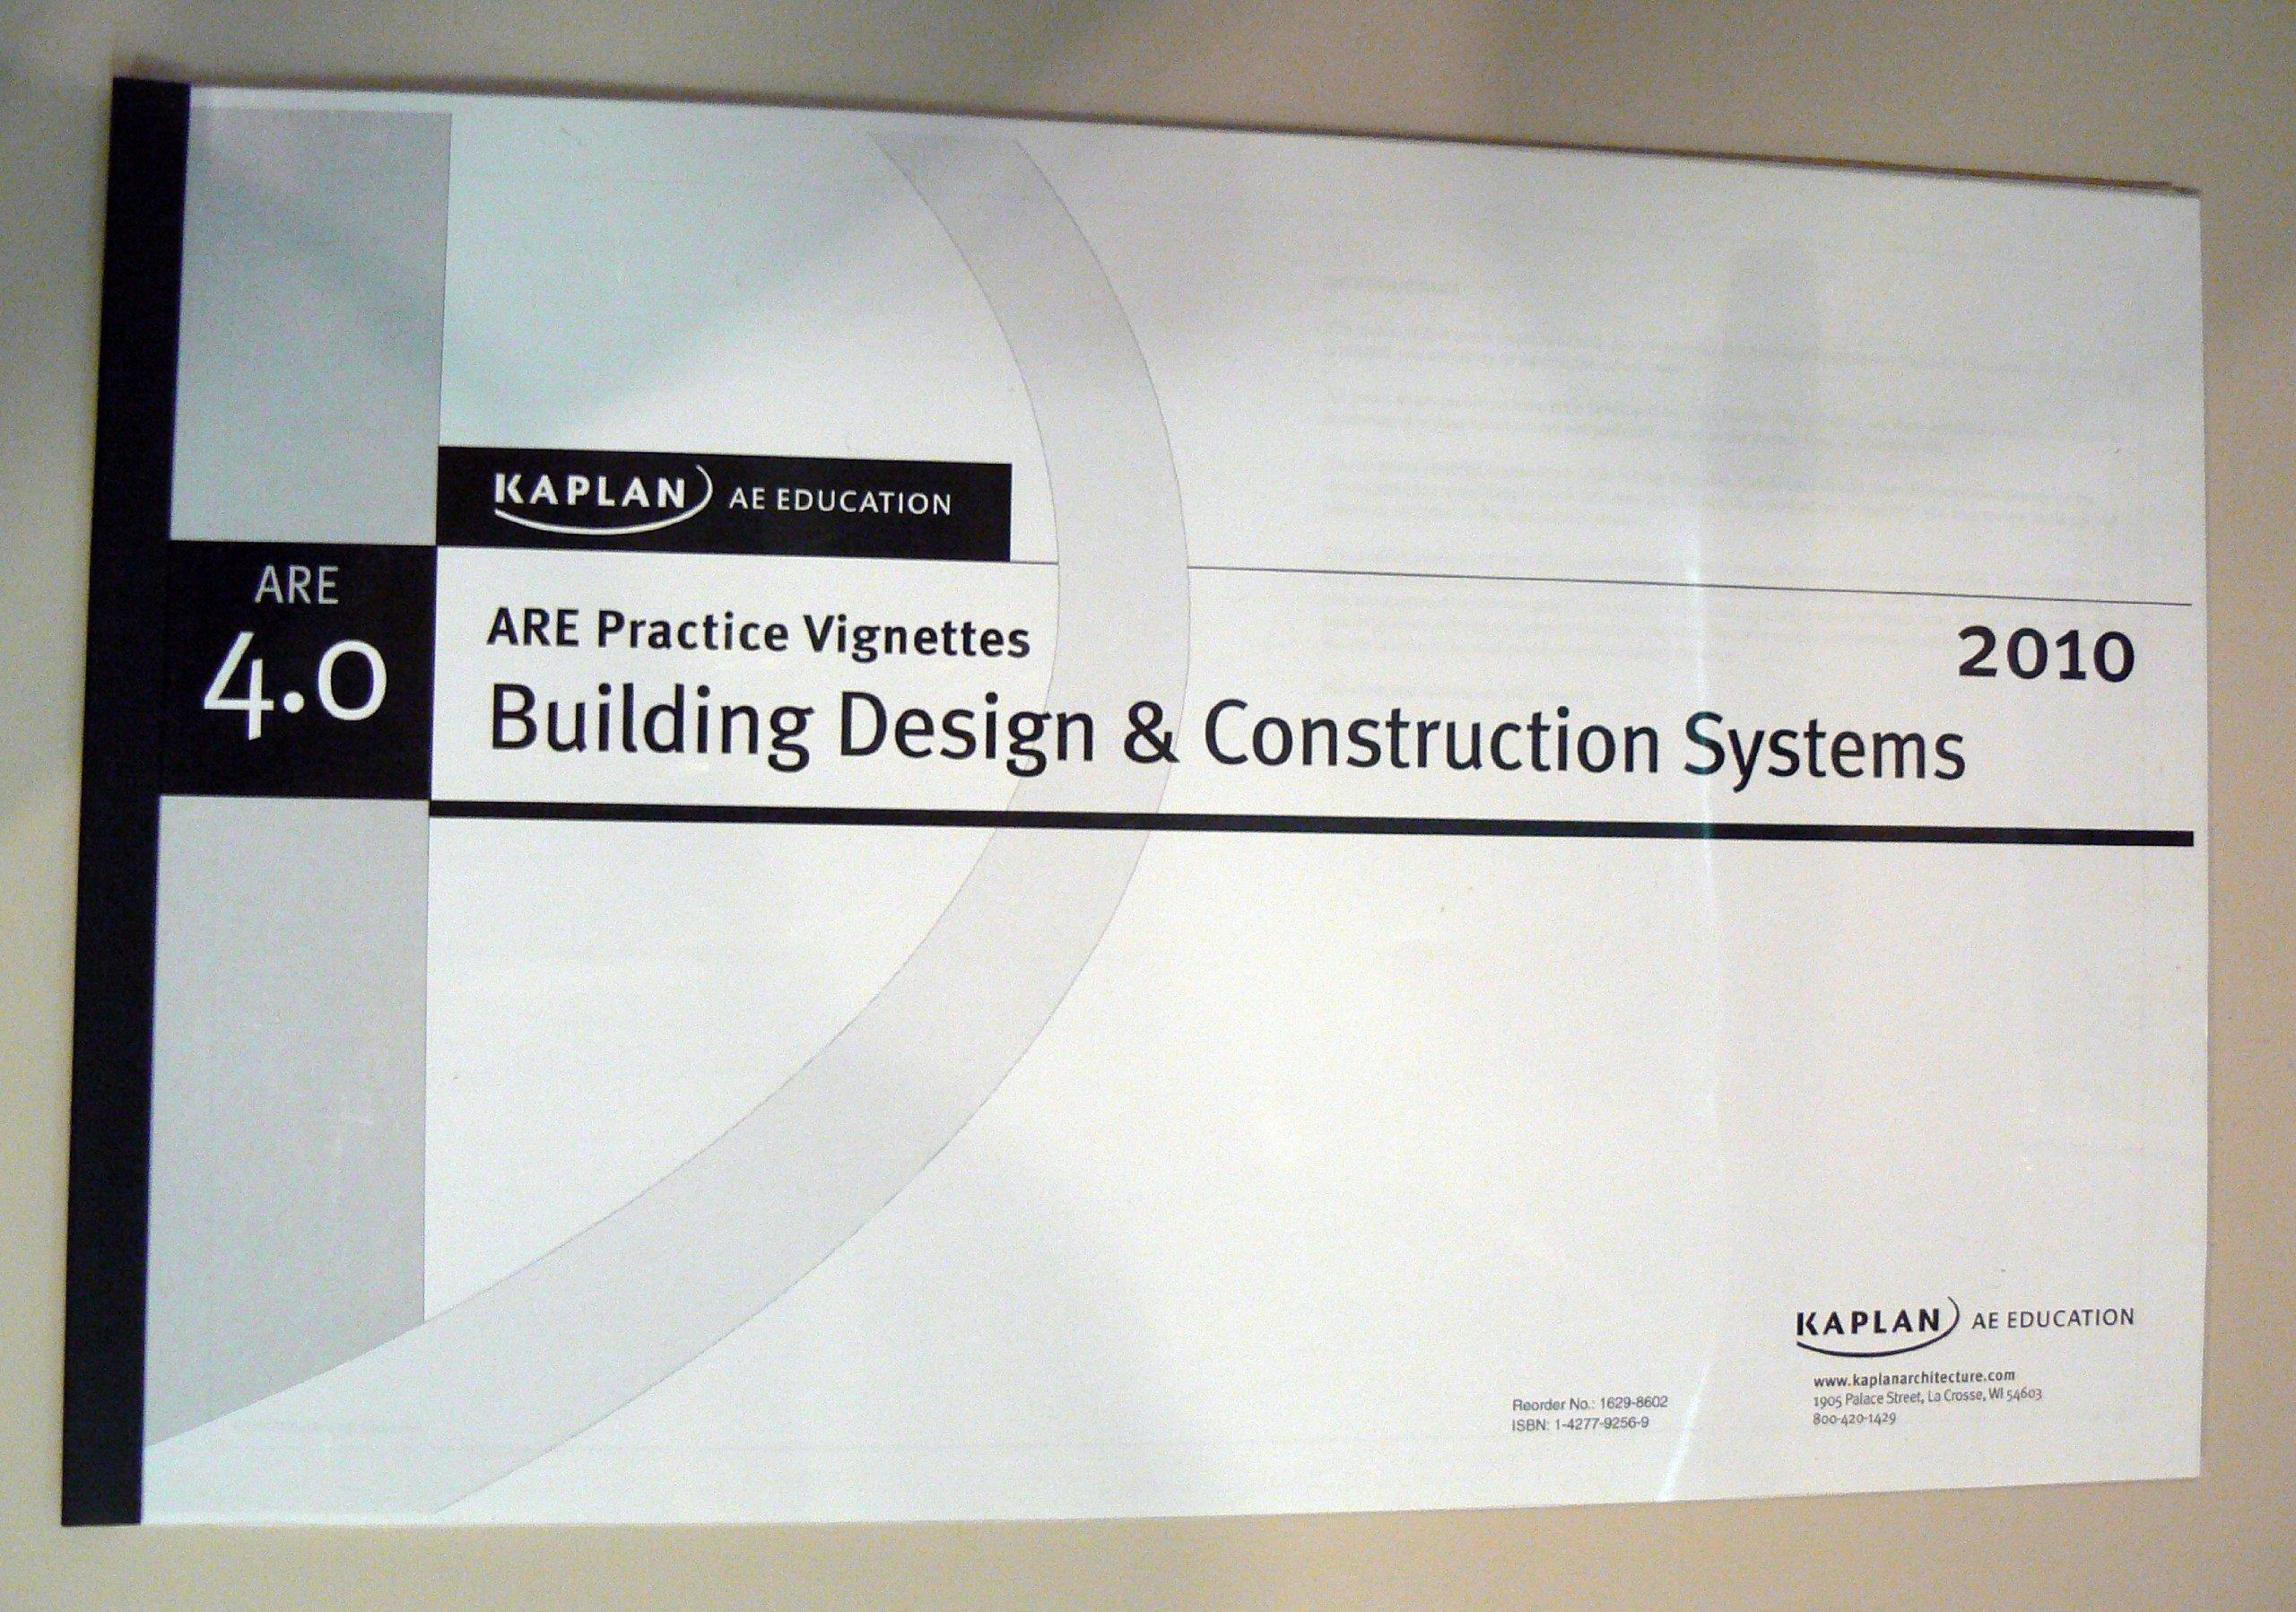 Kaplan Ae Education Are 40 Building Design Construction